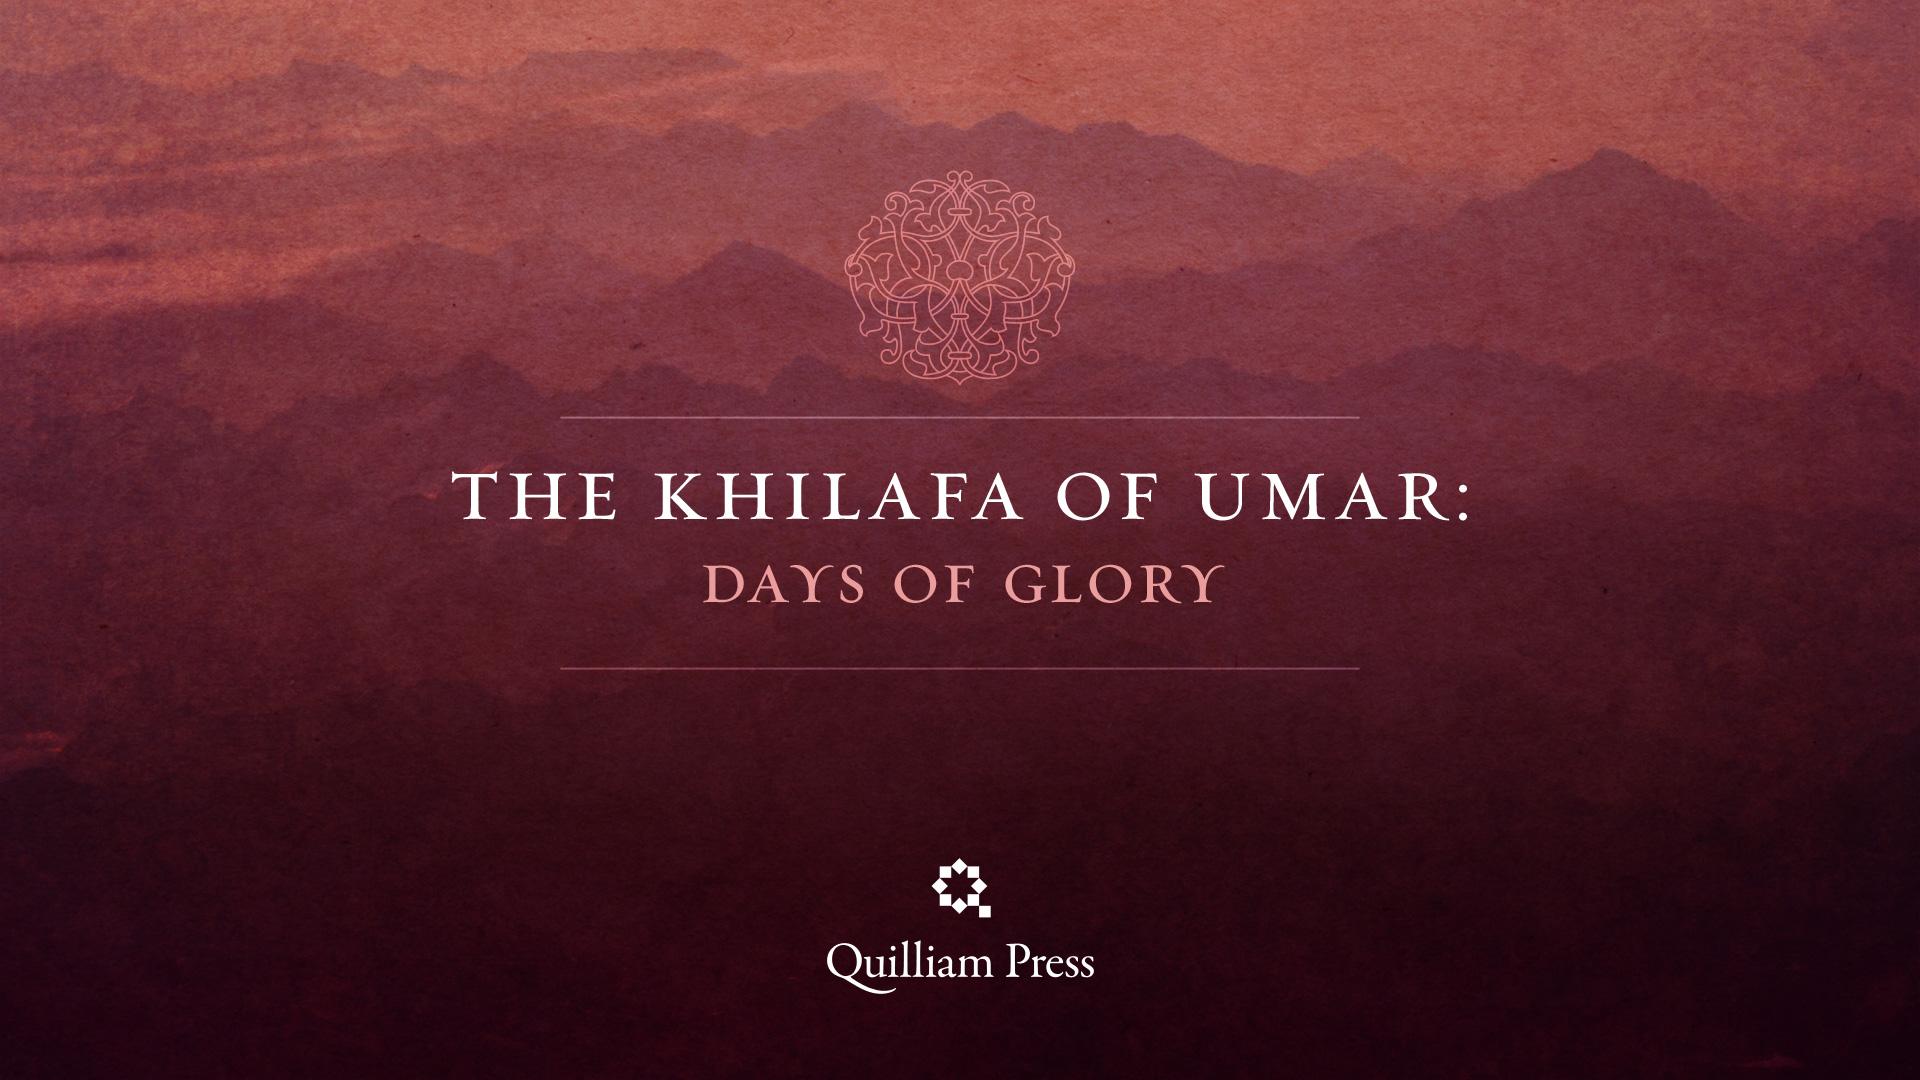 Quilliam_Press_Khilafa_Series_02.jpg